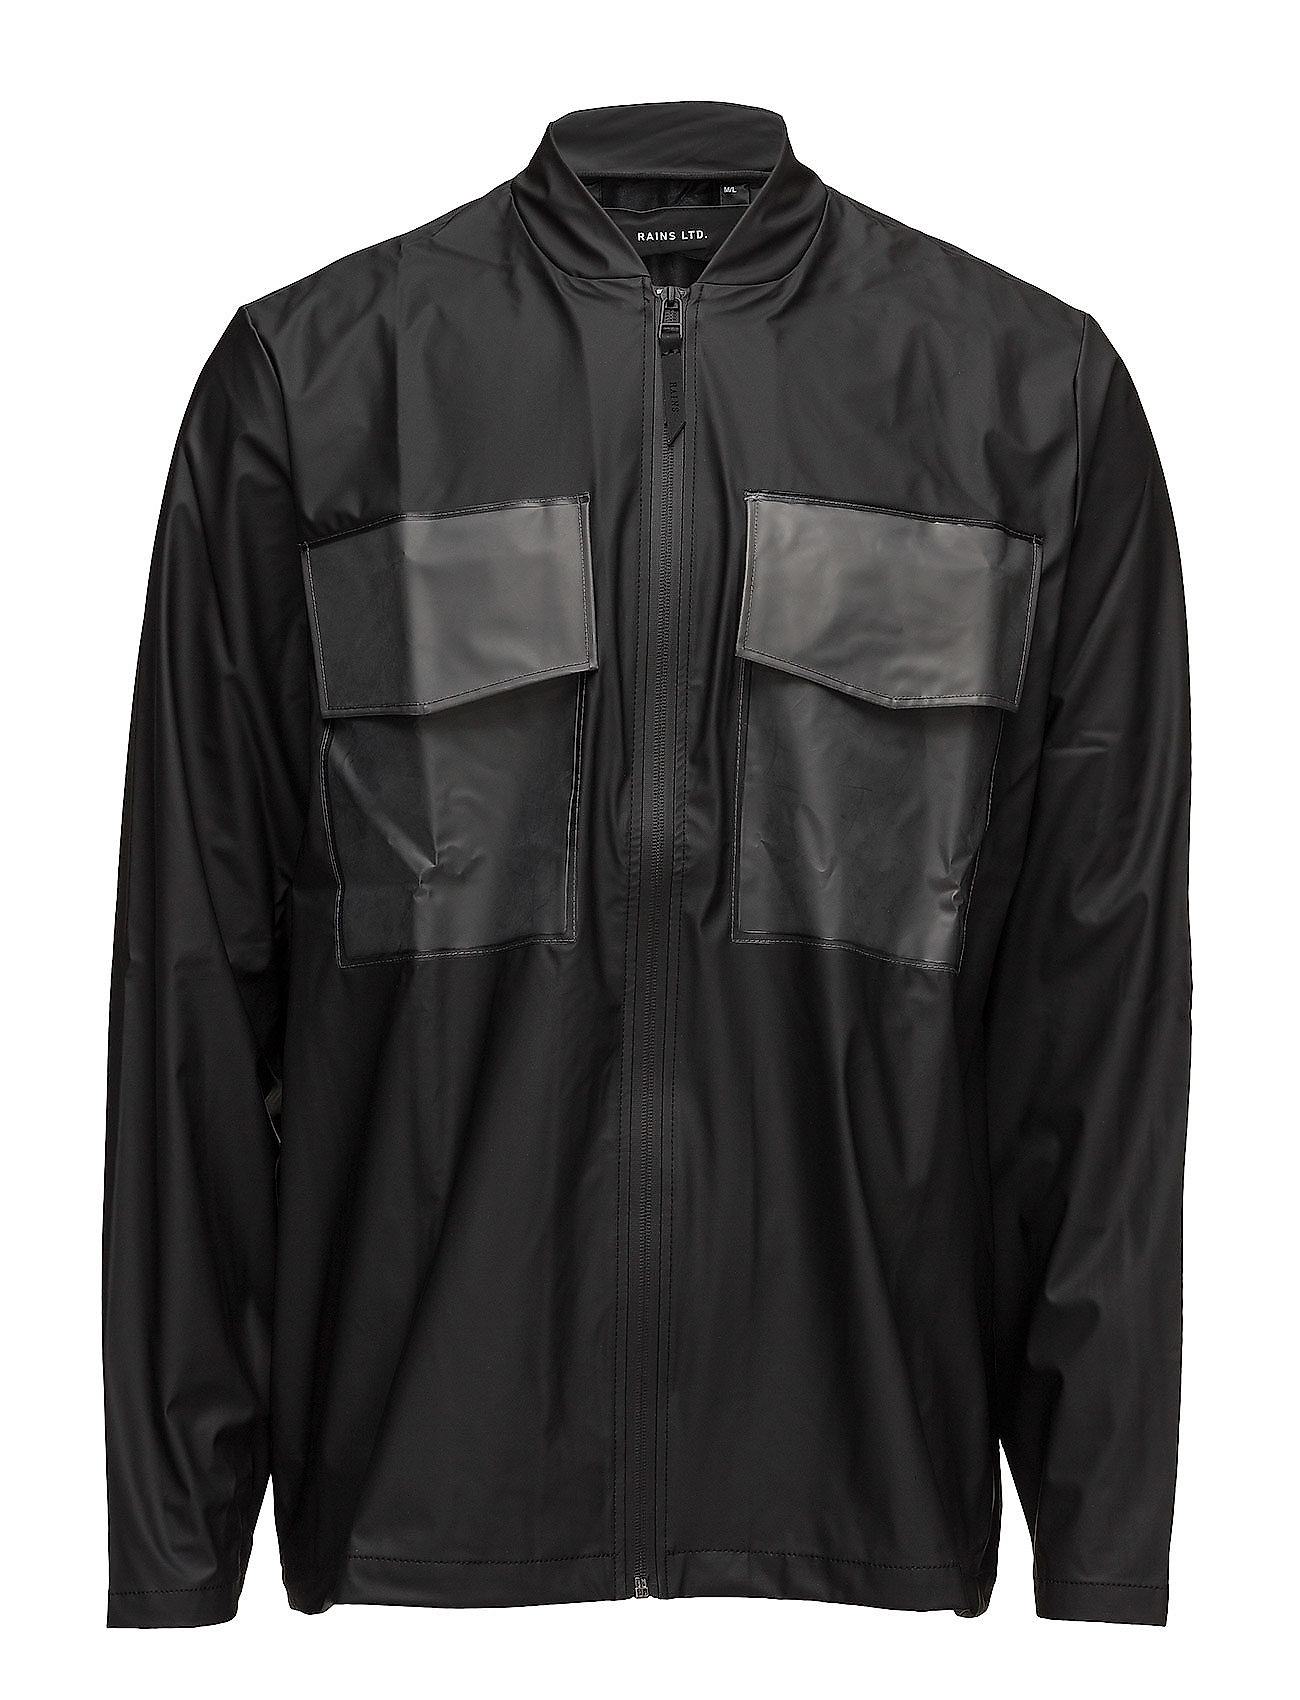 Warrant jacket fra rains på boozt.com dk